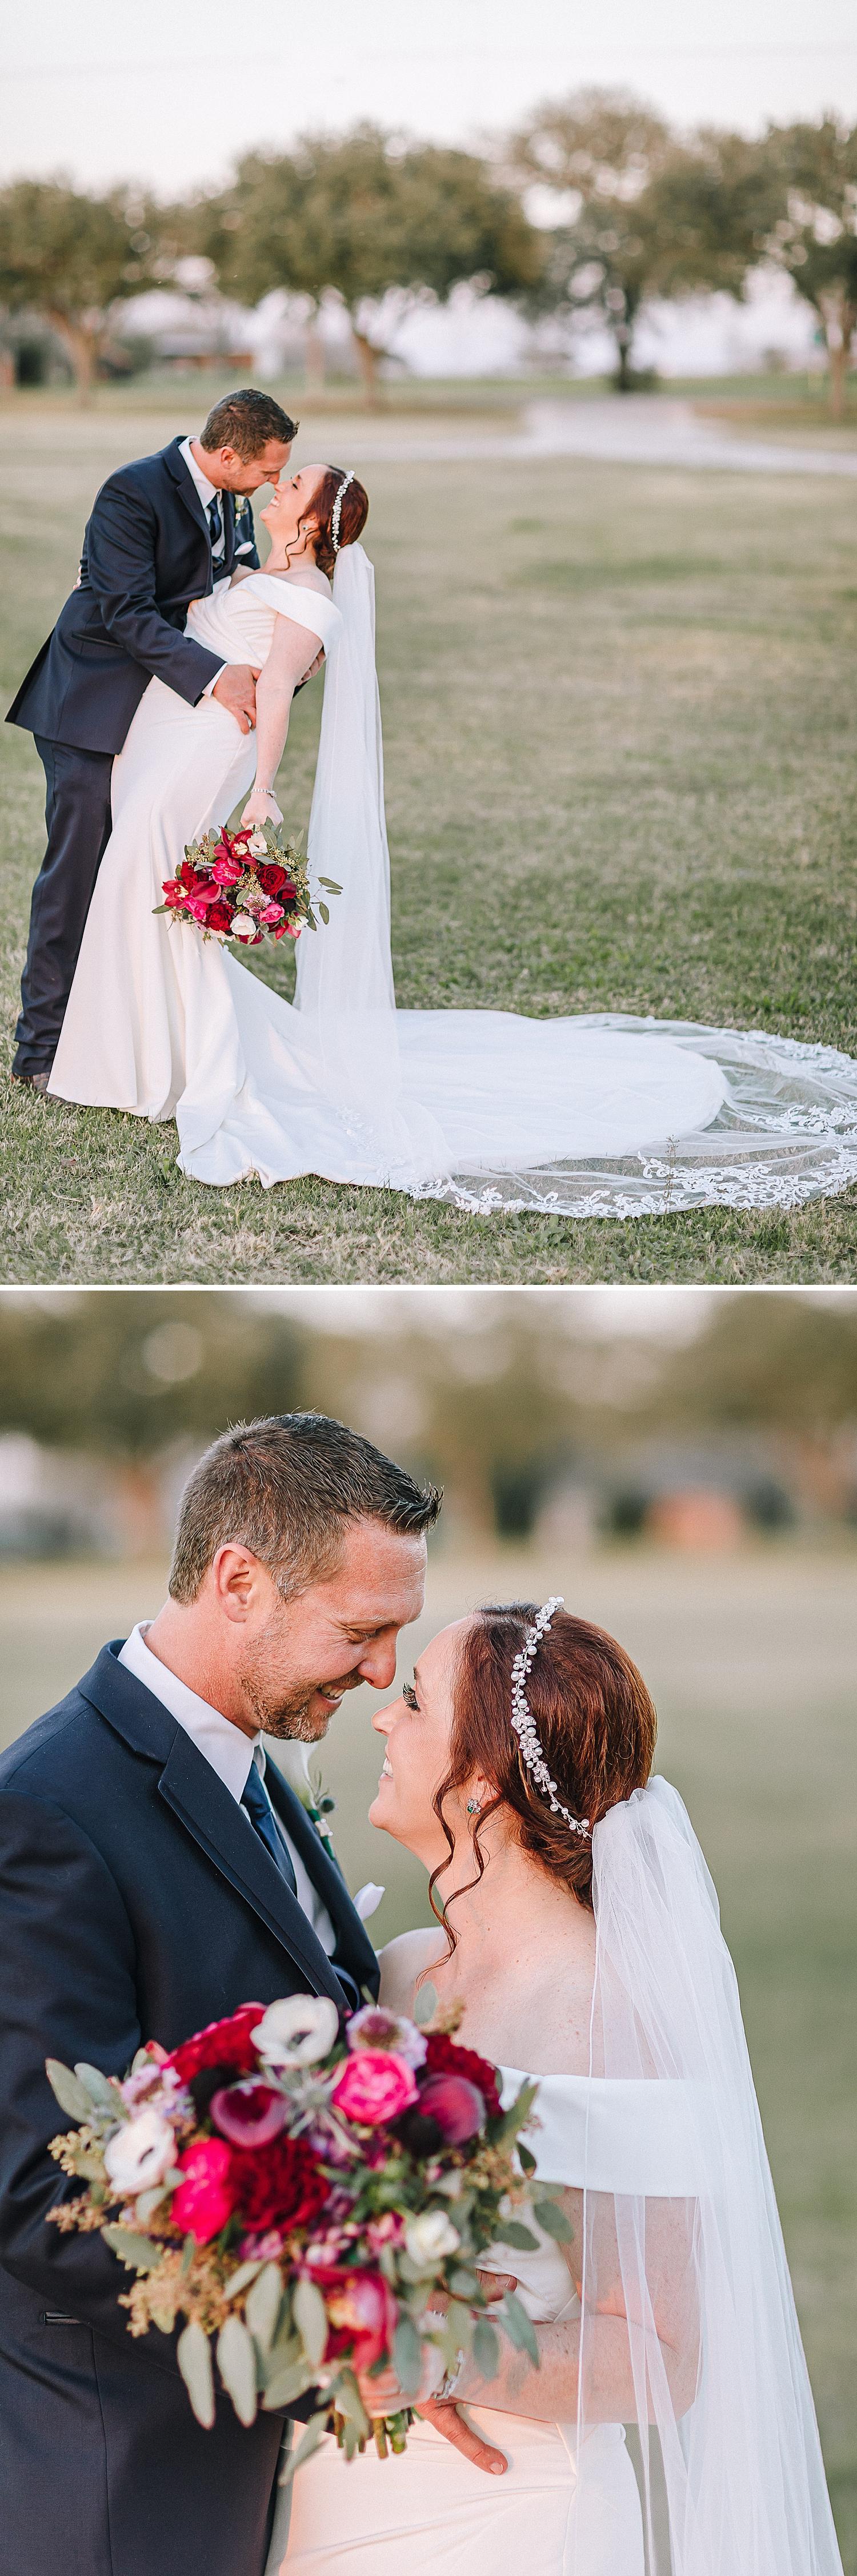 Jewel-Tone-Texas-Wedding-Valerie-Jason-Carly-Barton-Photography_0055.jpg